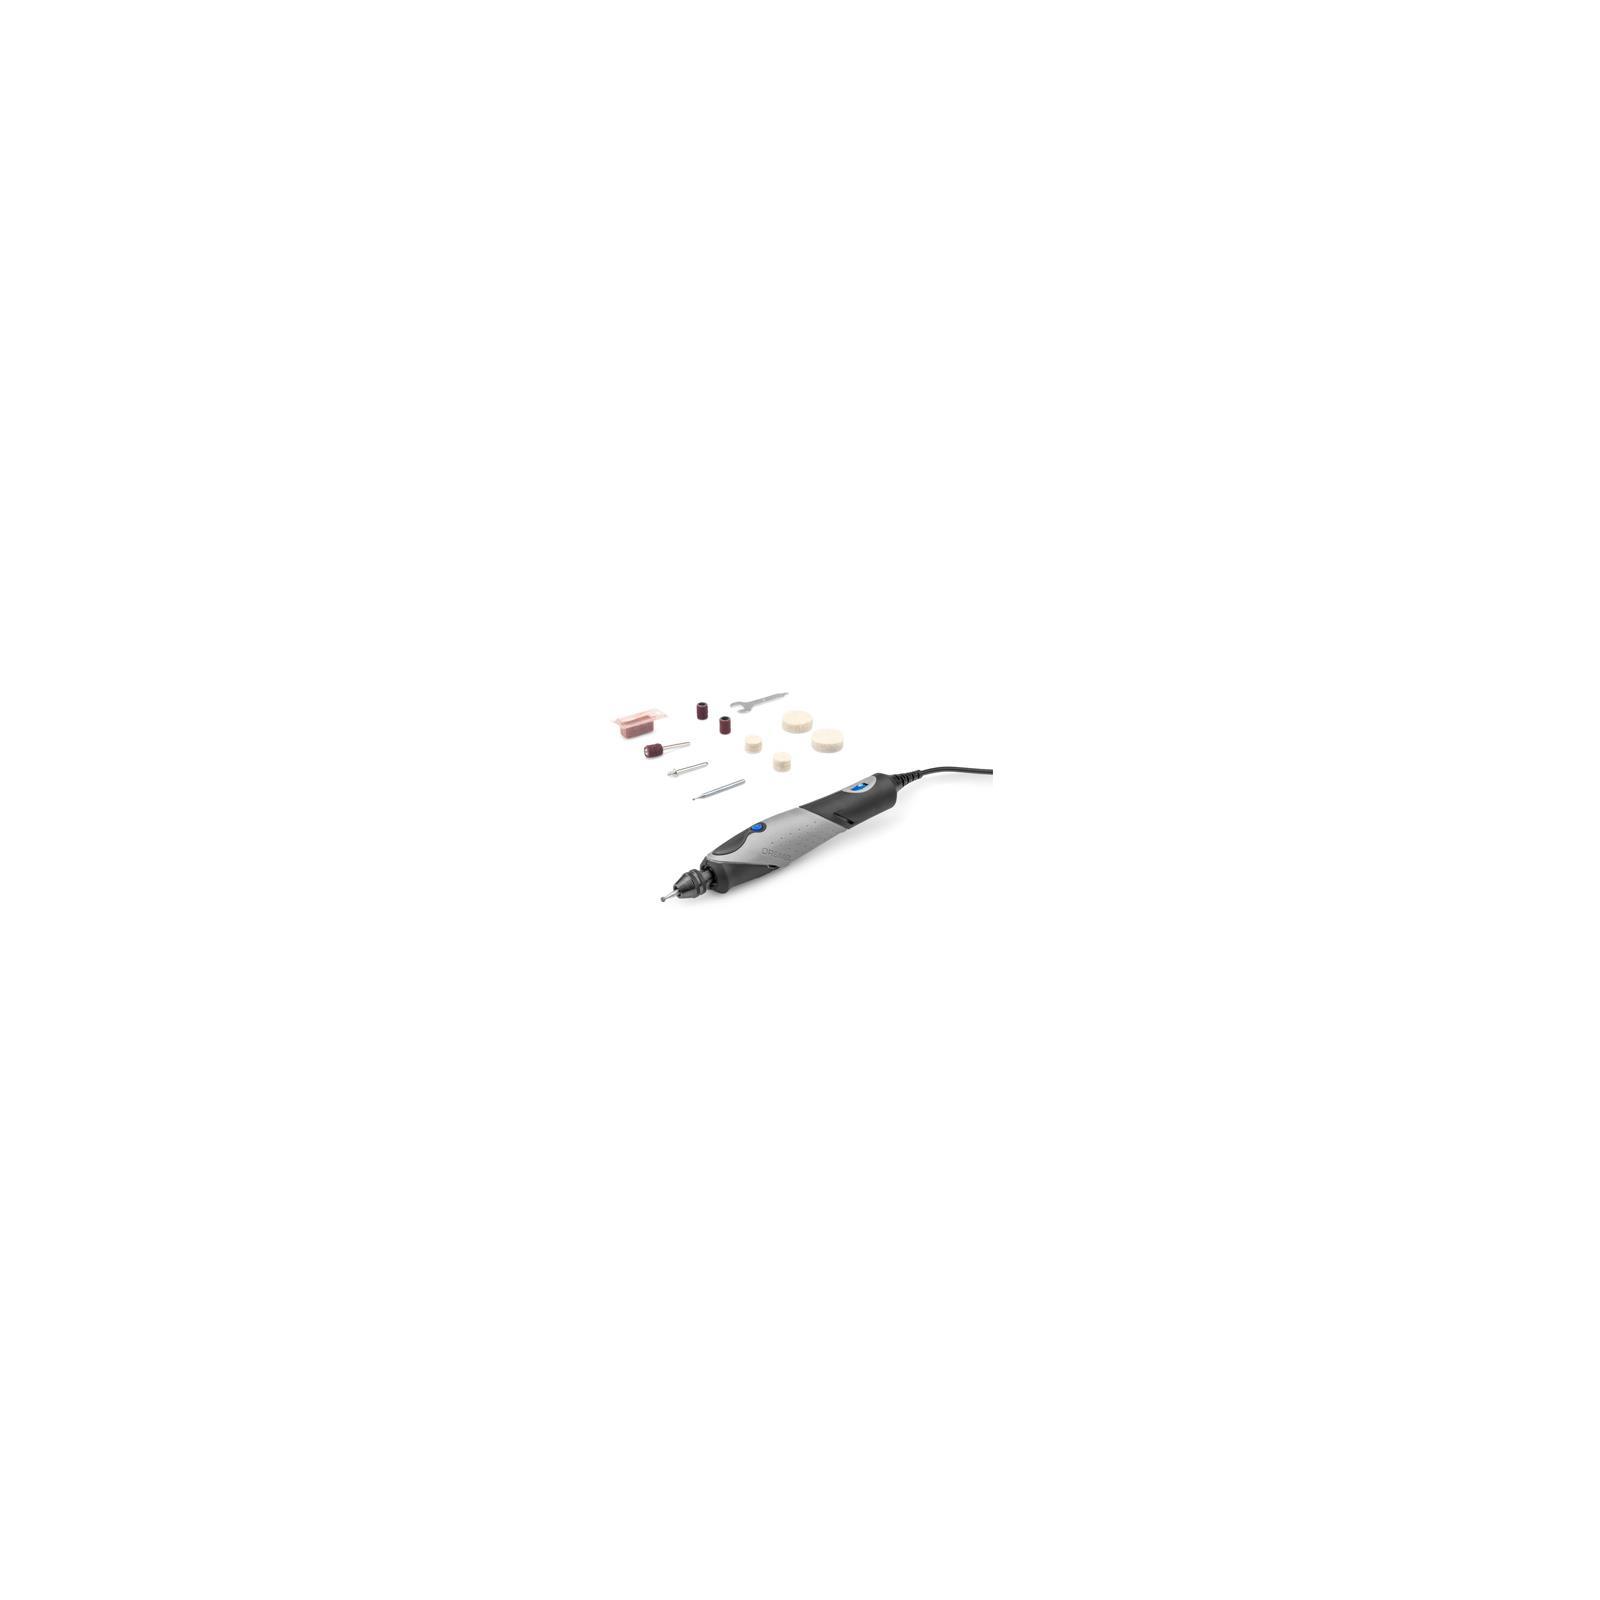 Dremel 2050-15 Stylo+ Versatile Craft Tool